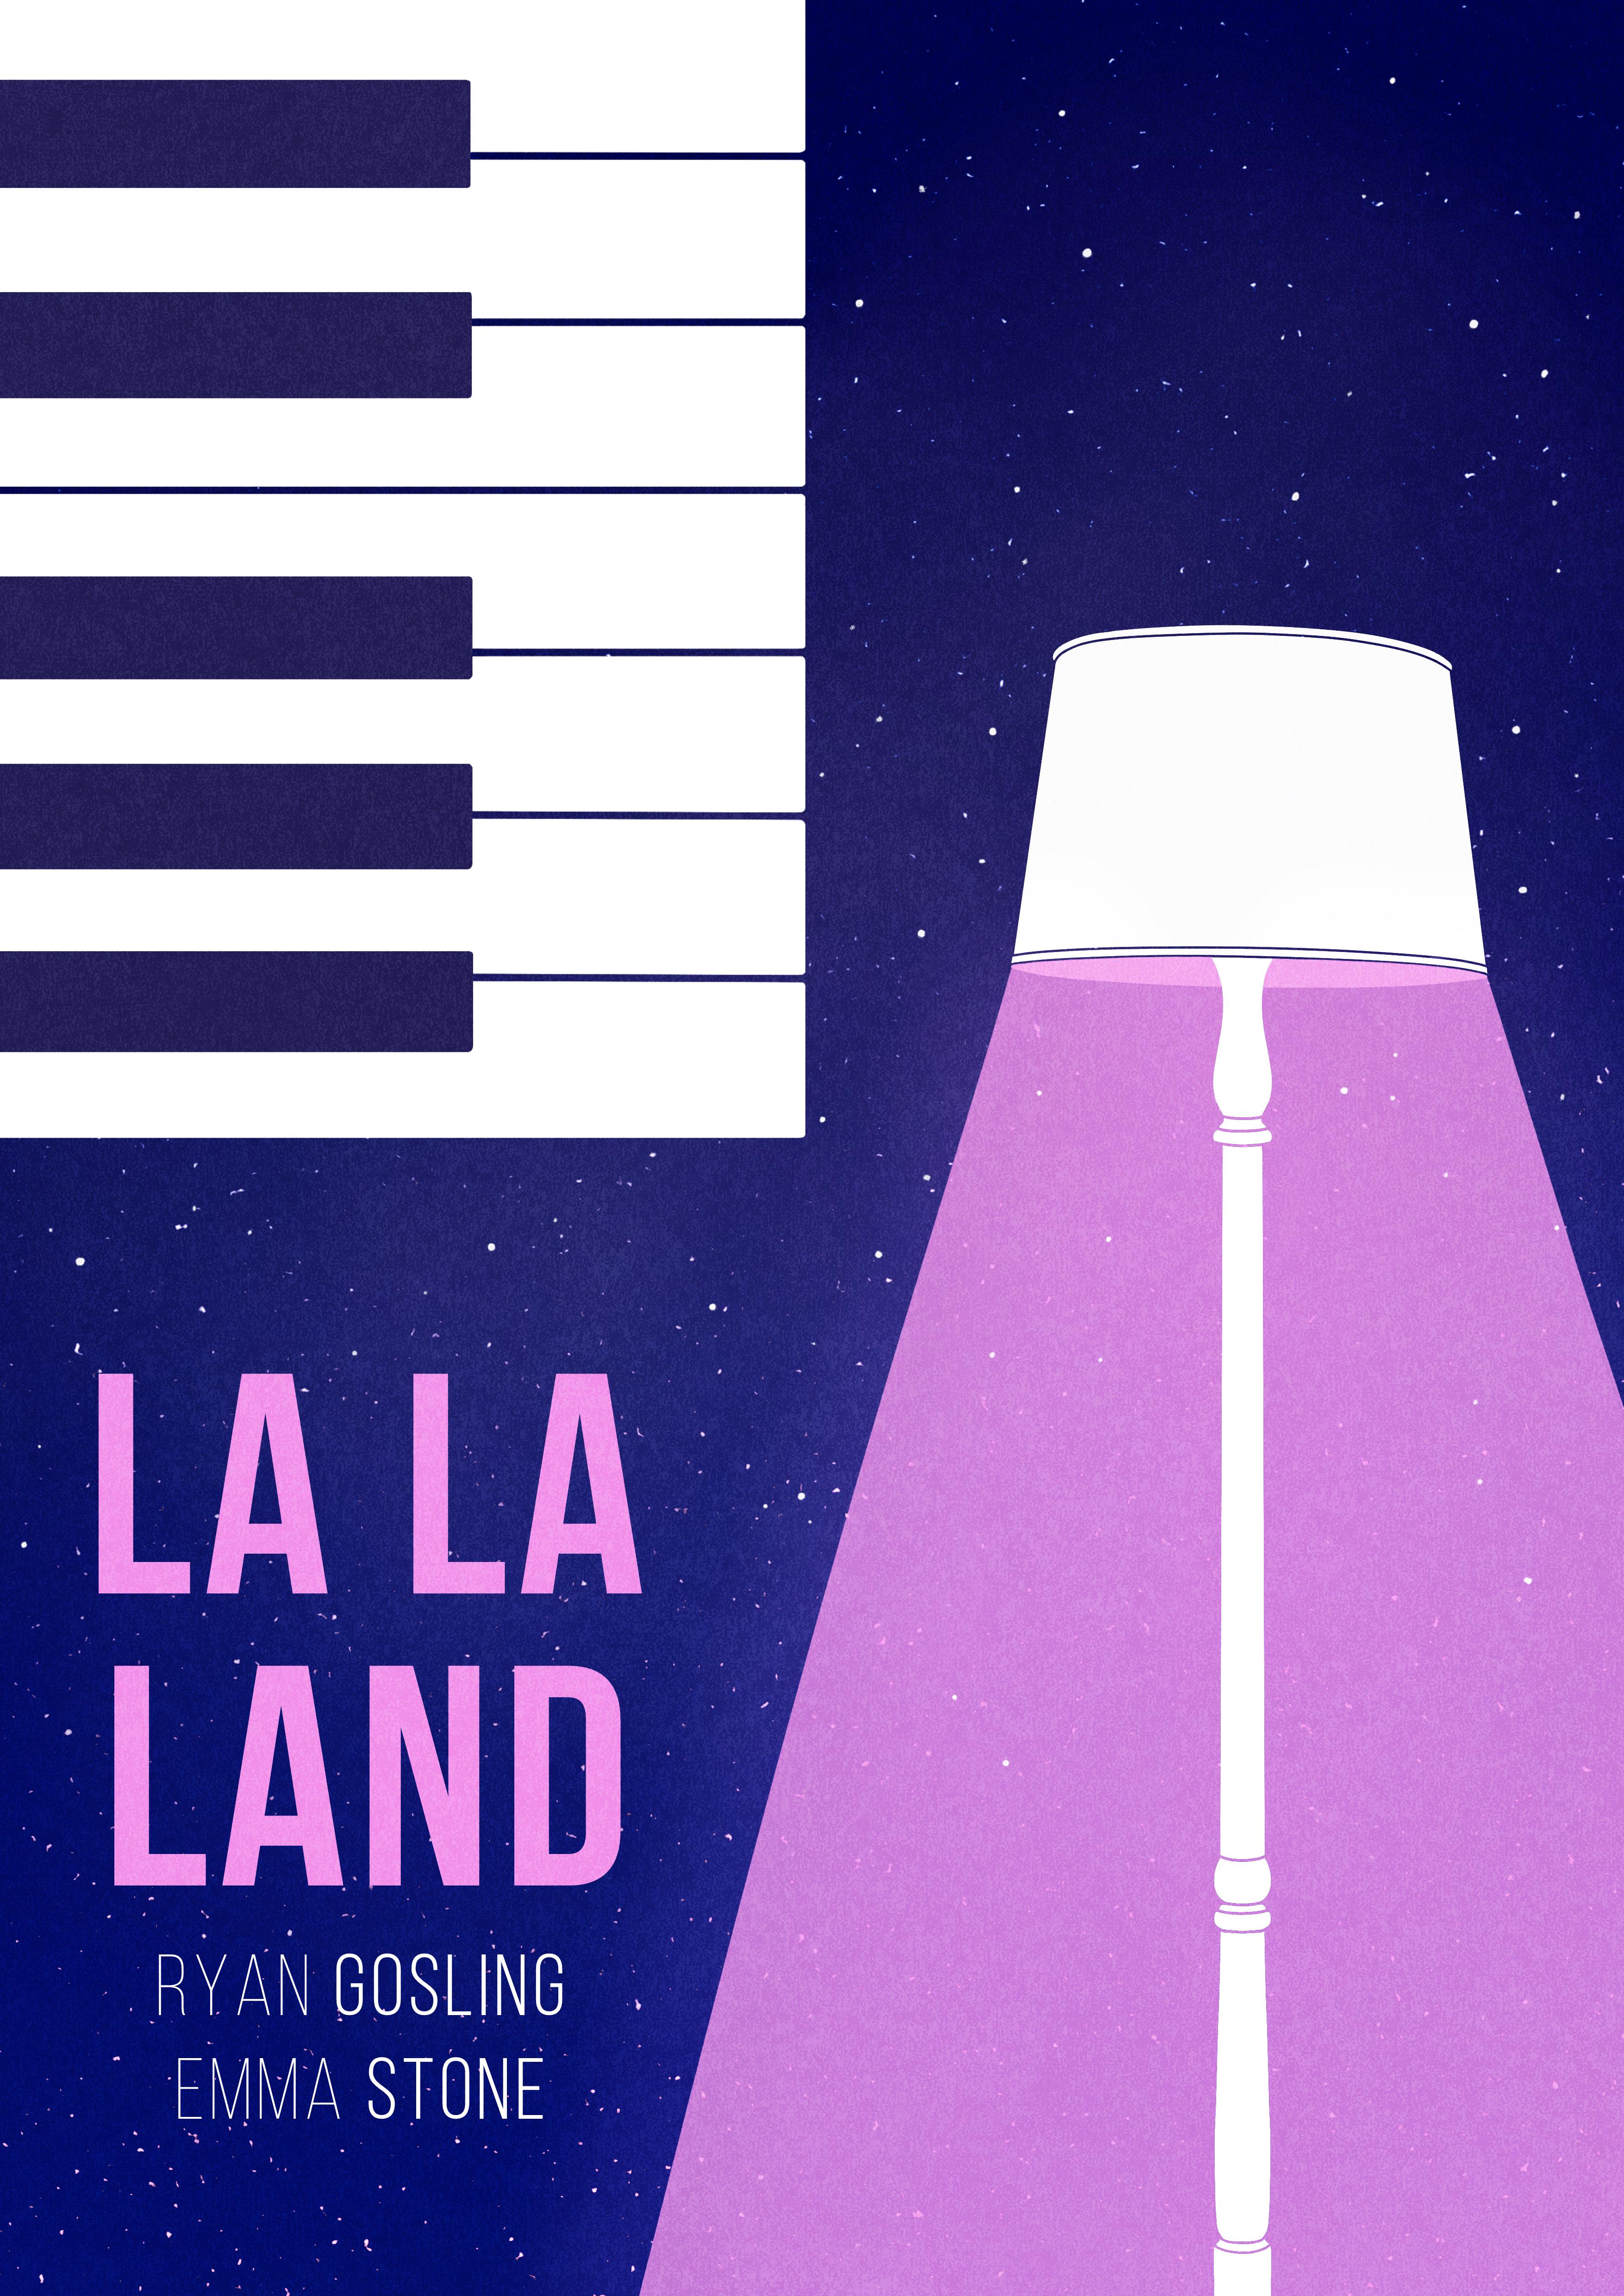 La-La-Land-poster-by-RINOMONSTA